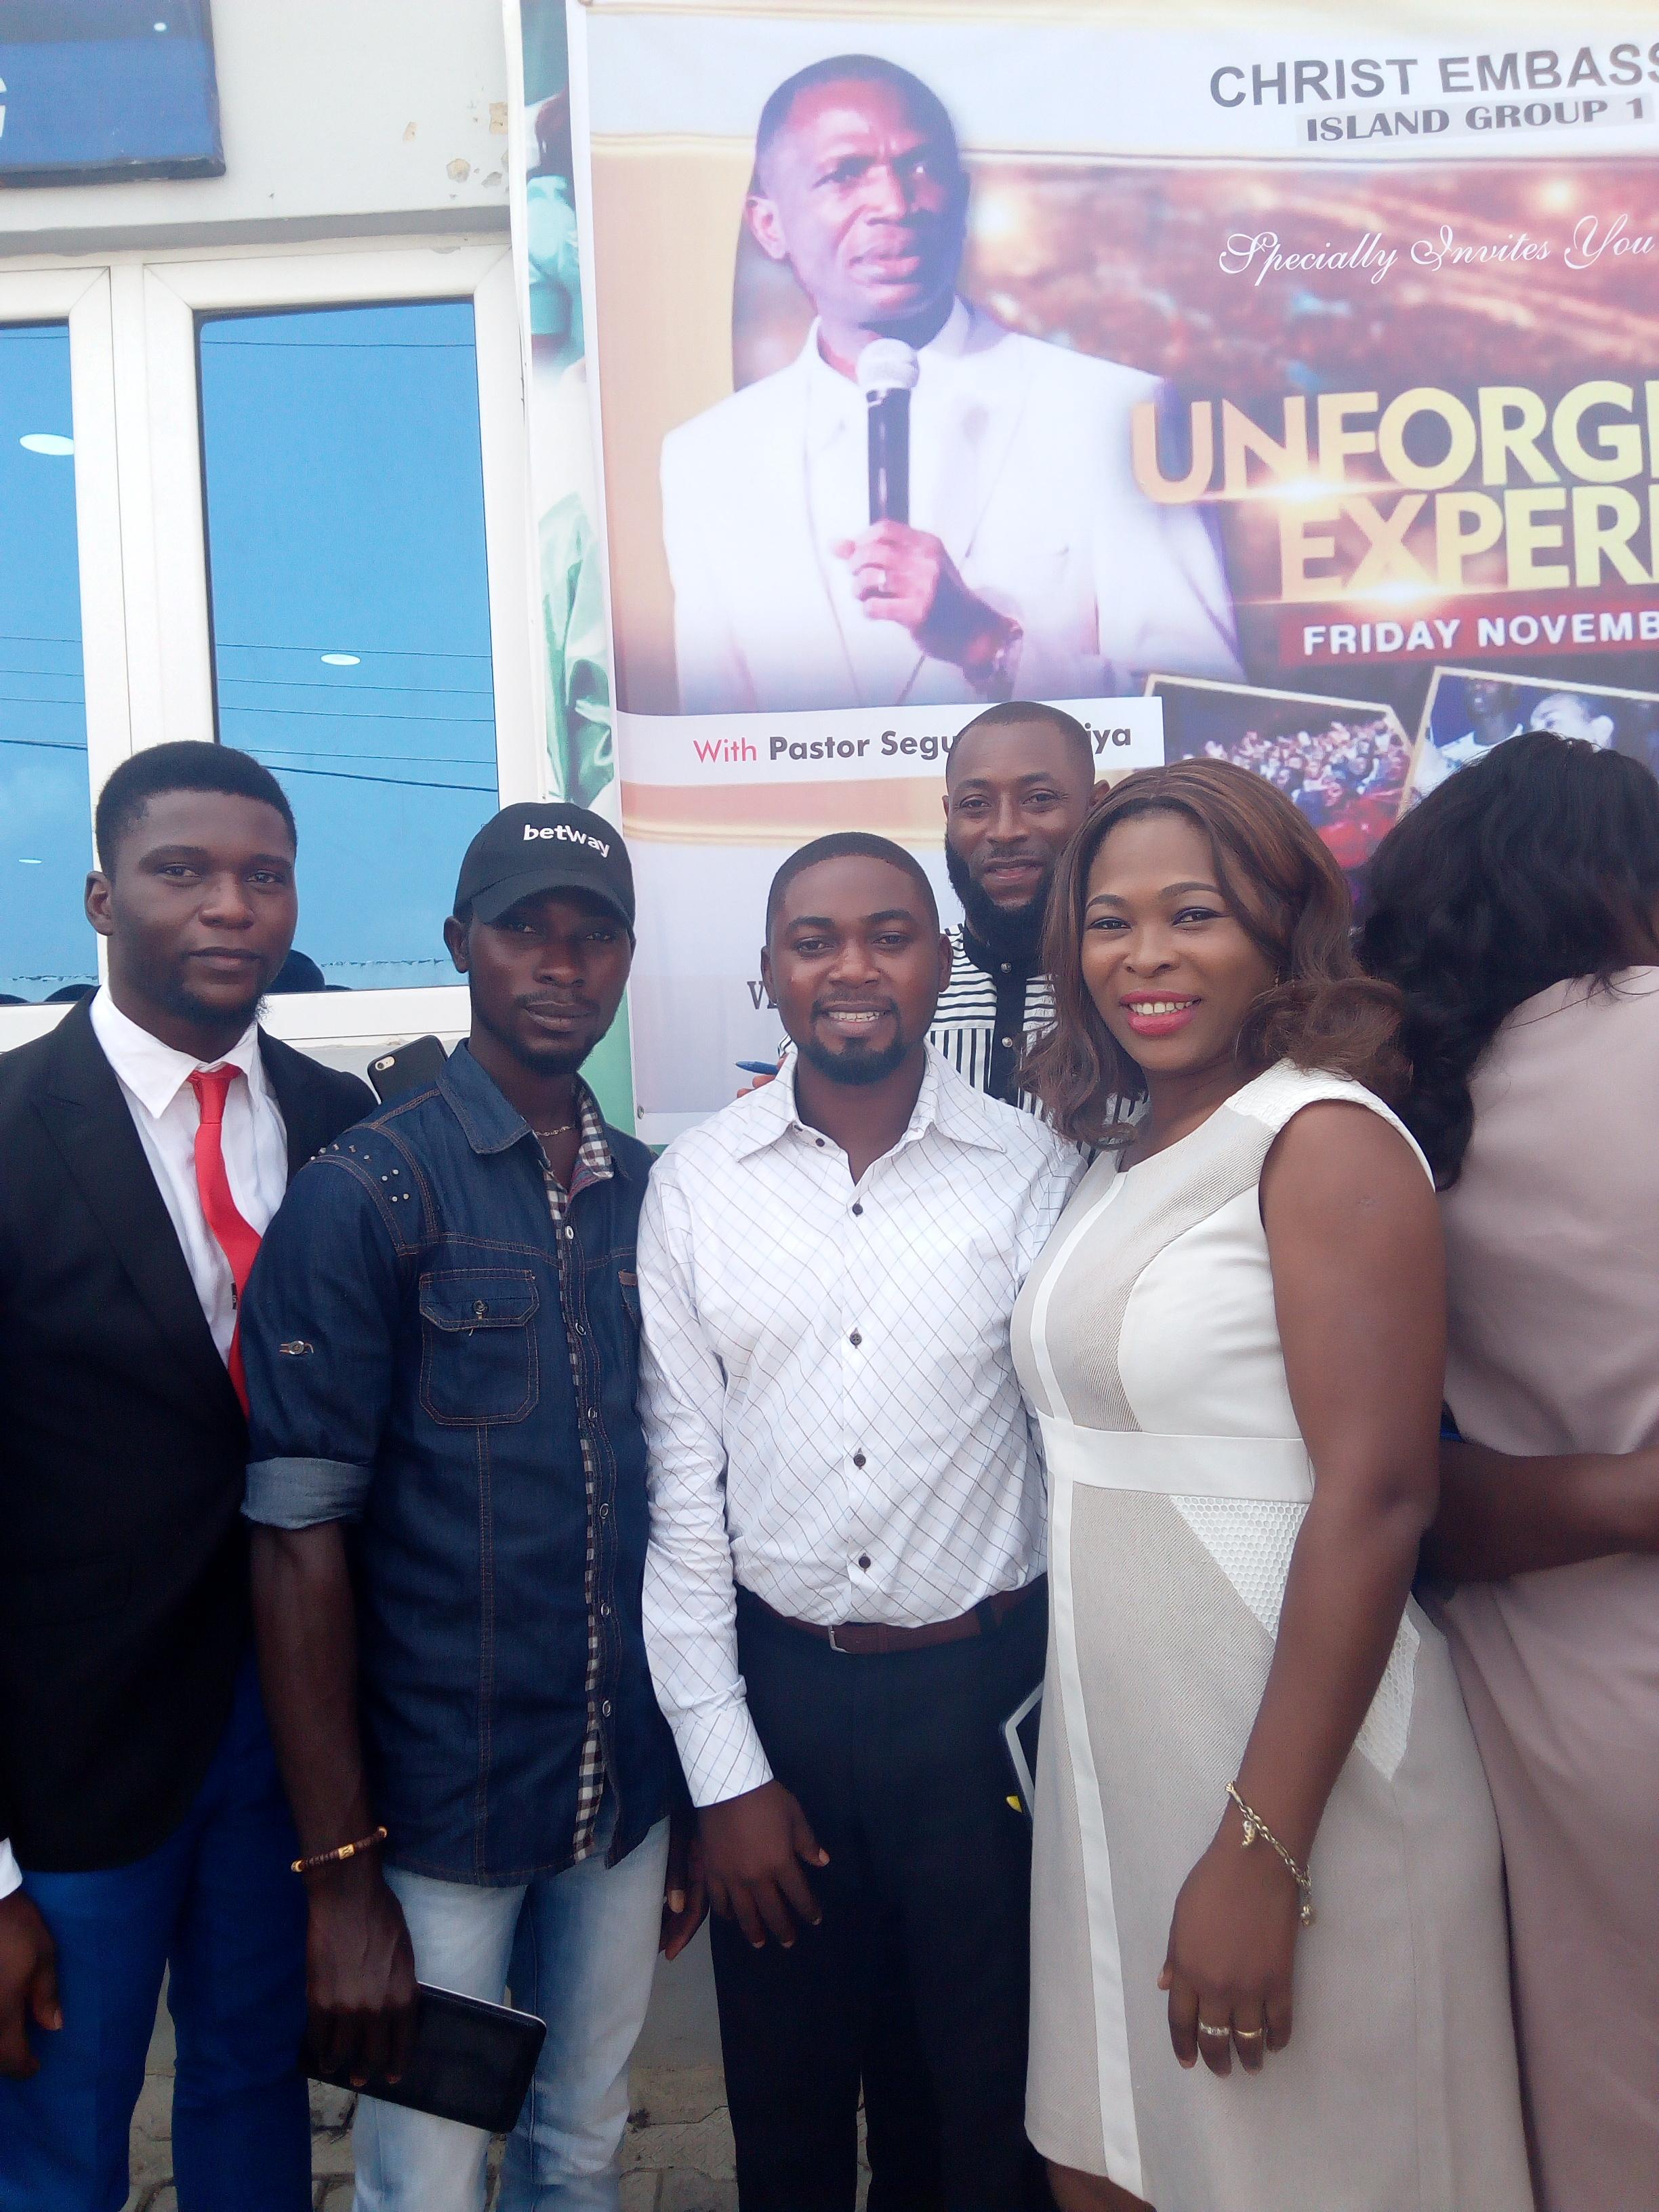 #UnforgetableExperience#Islandgoup1#CEAjiwe#LagosZ